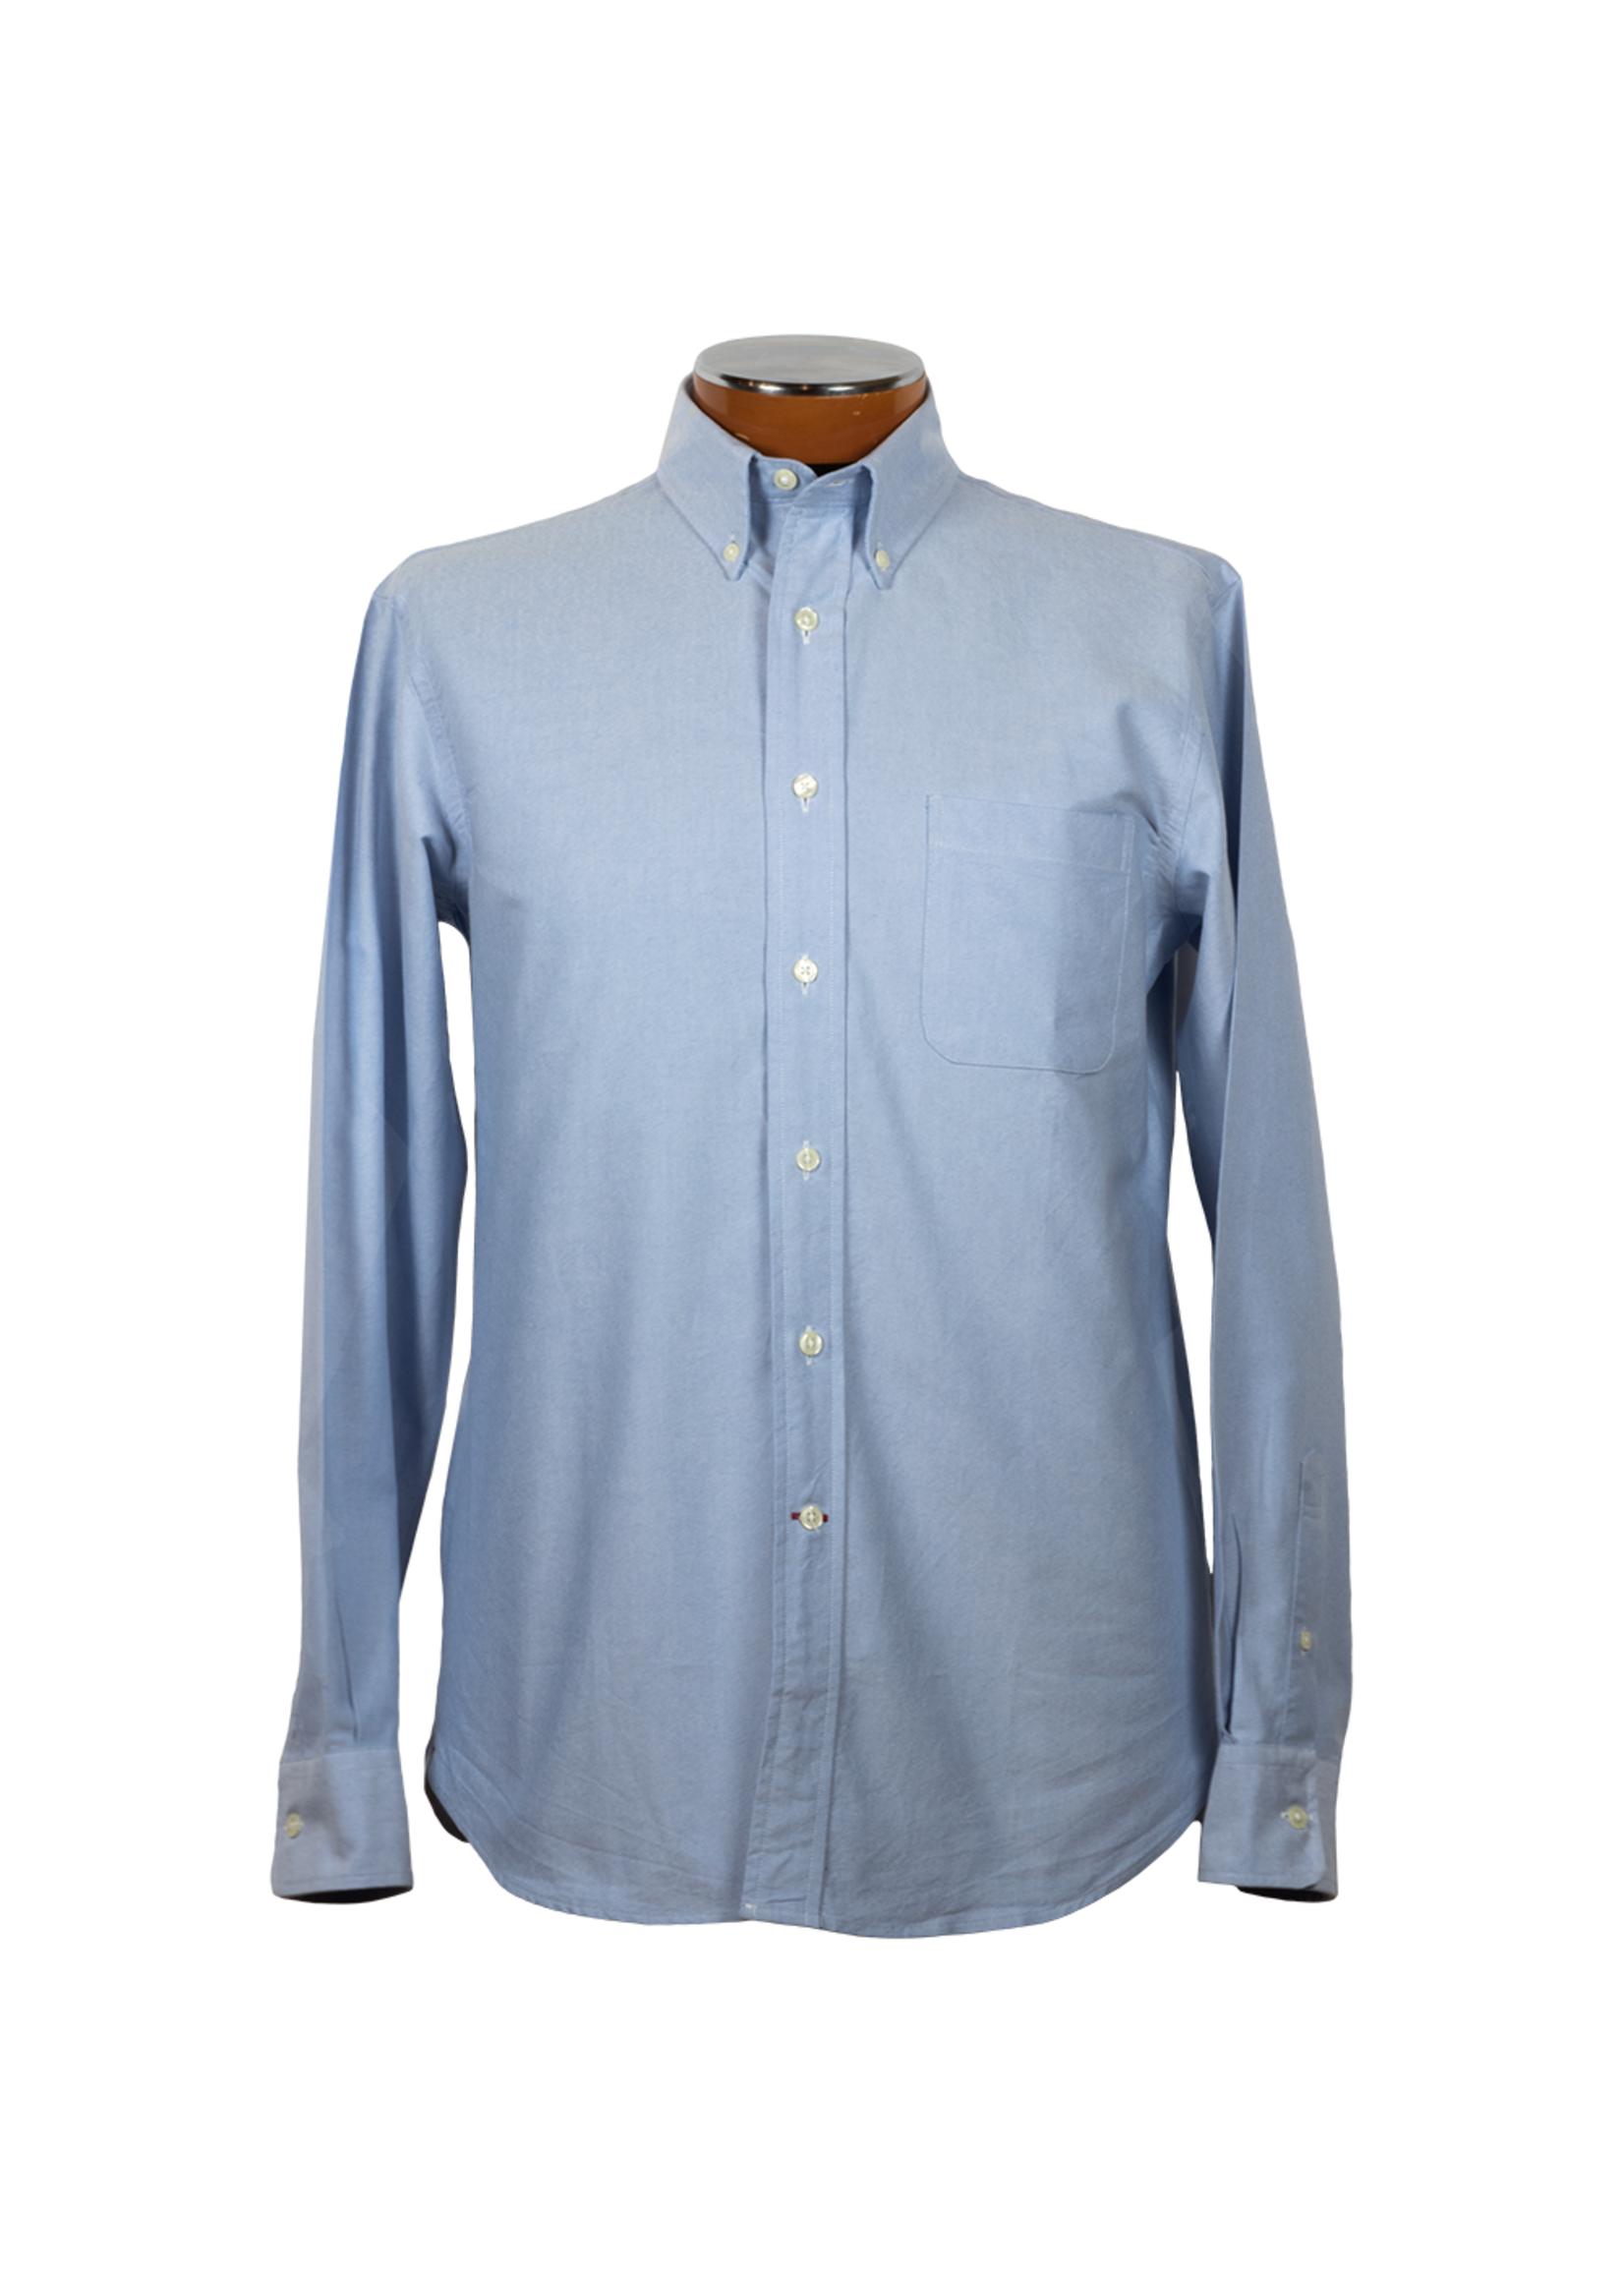 Drinkwater's Drinkwater's Blue Cambridge Oxford Buttondown Shirt